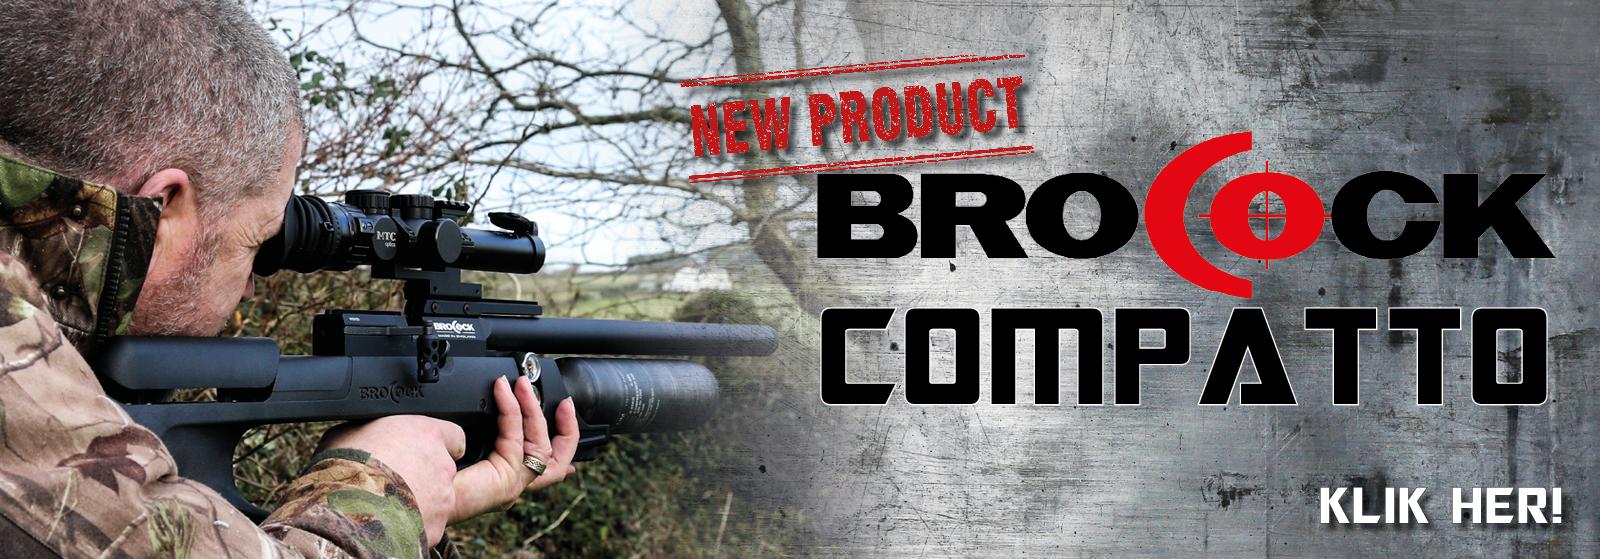 Brocock Compatto PCP-luftgevær hos AIRGUN.dk